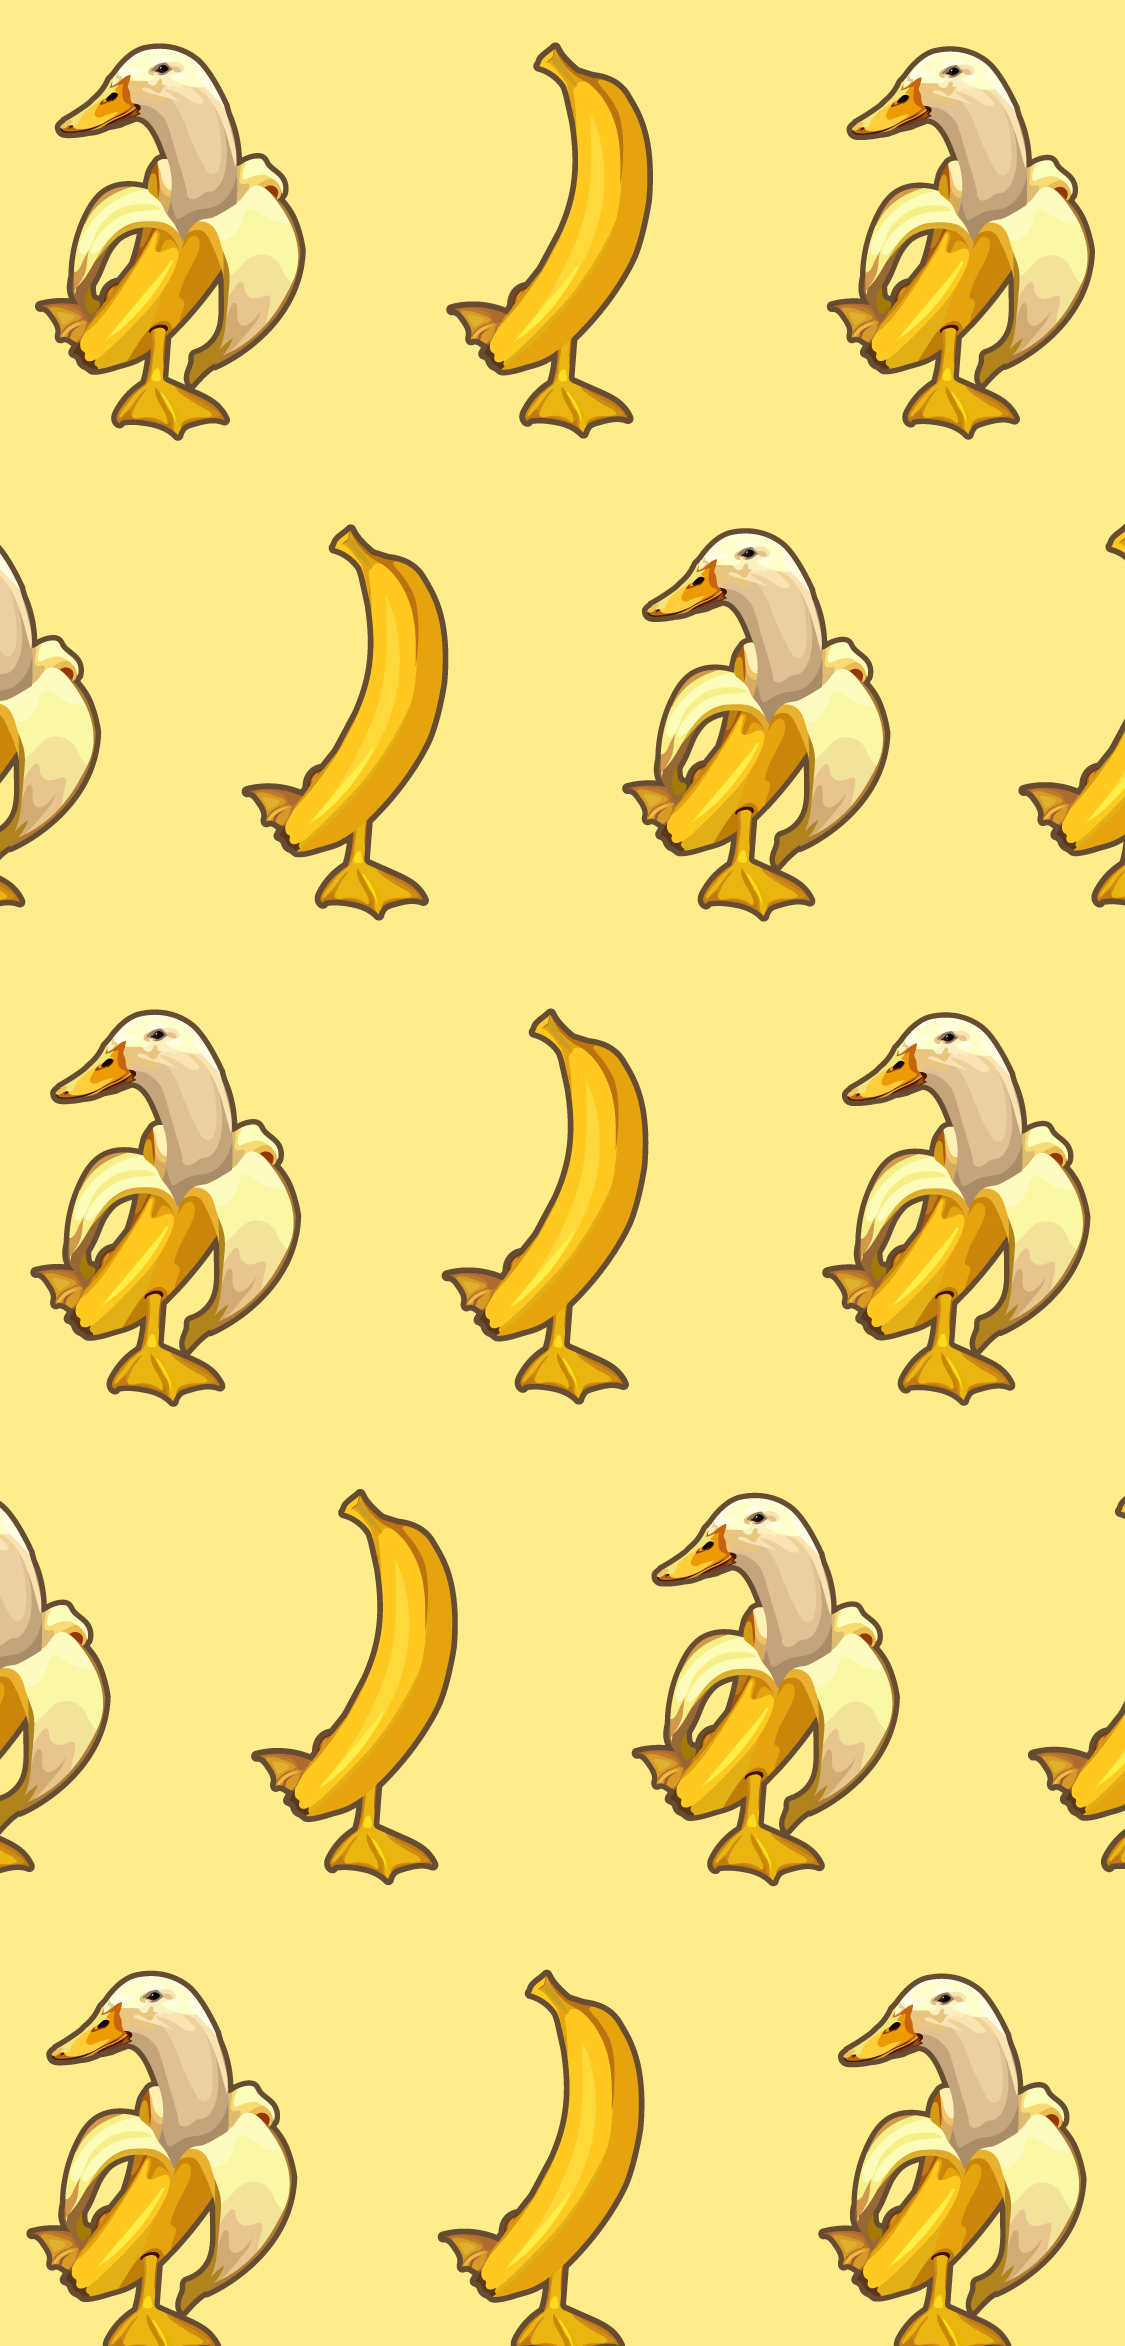 Banana Duck Meme Phone Wallpaper Cute Simple Wallpapers Funny Phone Wallpaper Cute Patterns Wallpaper